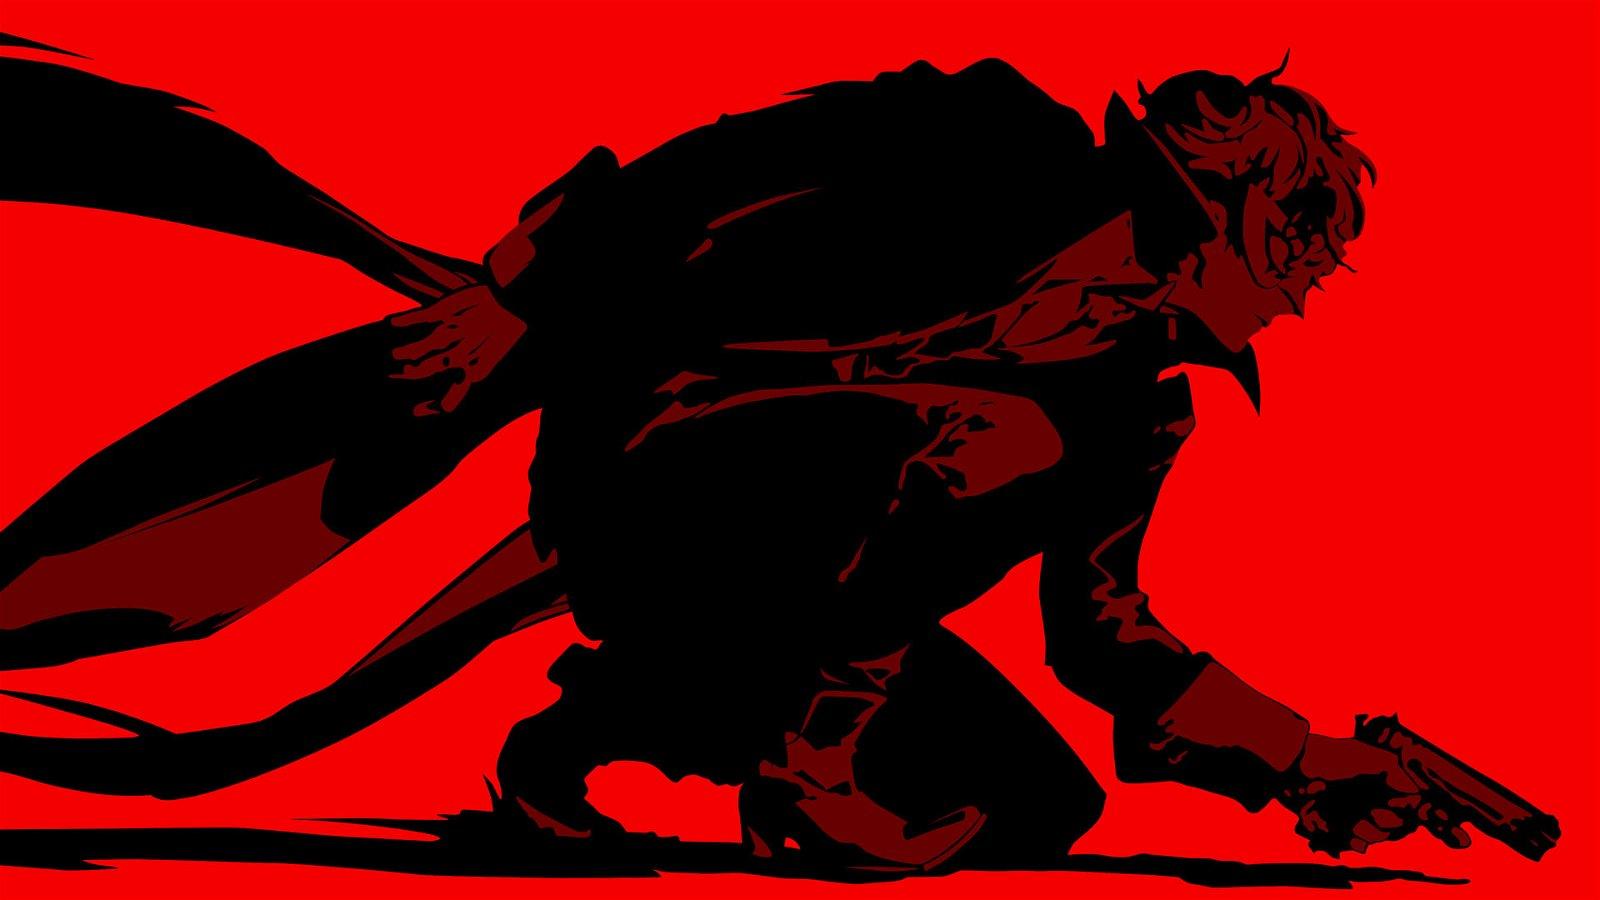 Persona 5 Guide: Final Boss 1